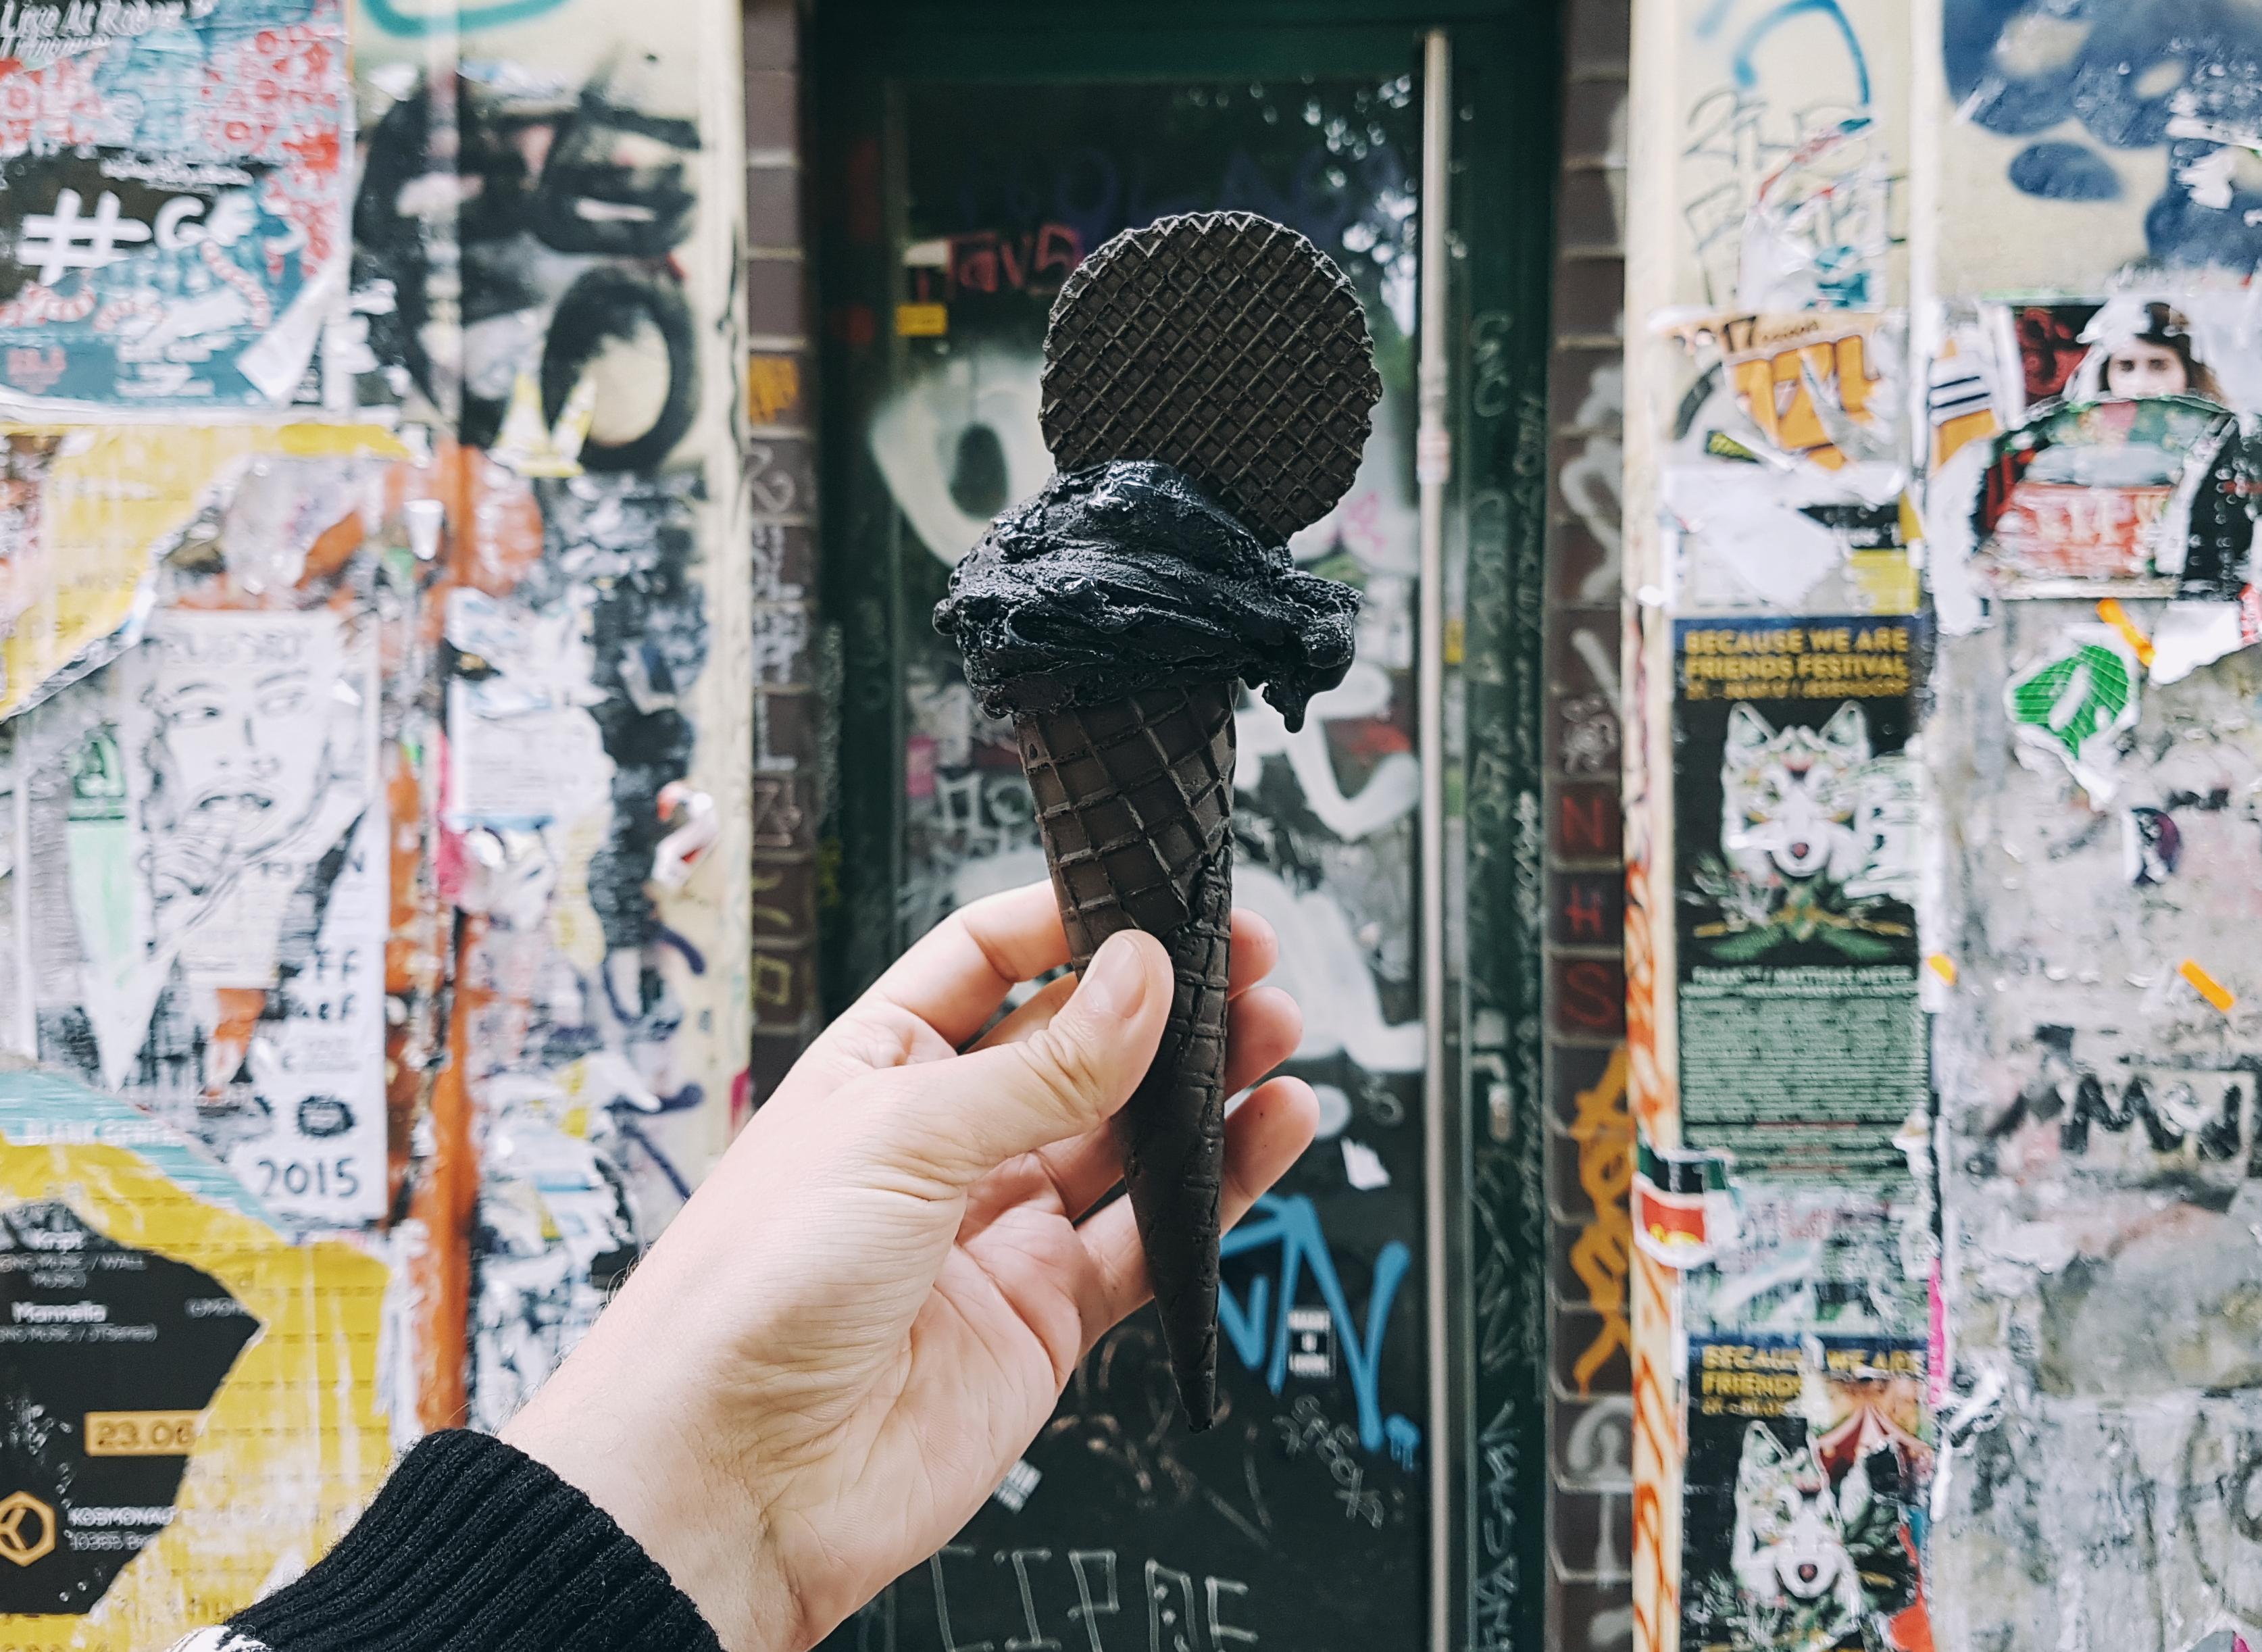 Your Berghain-style Black Ice Cream